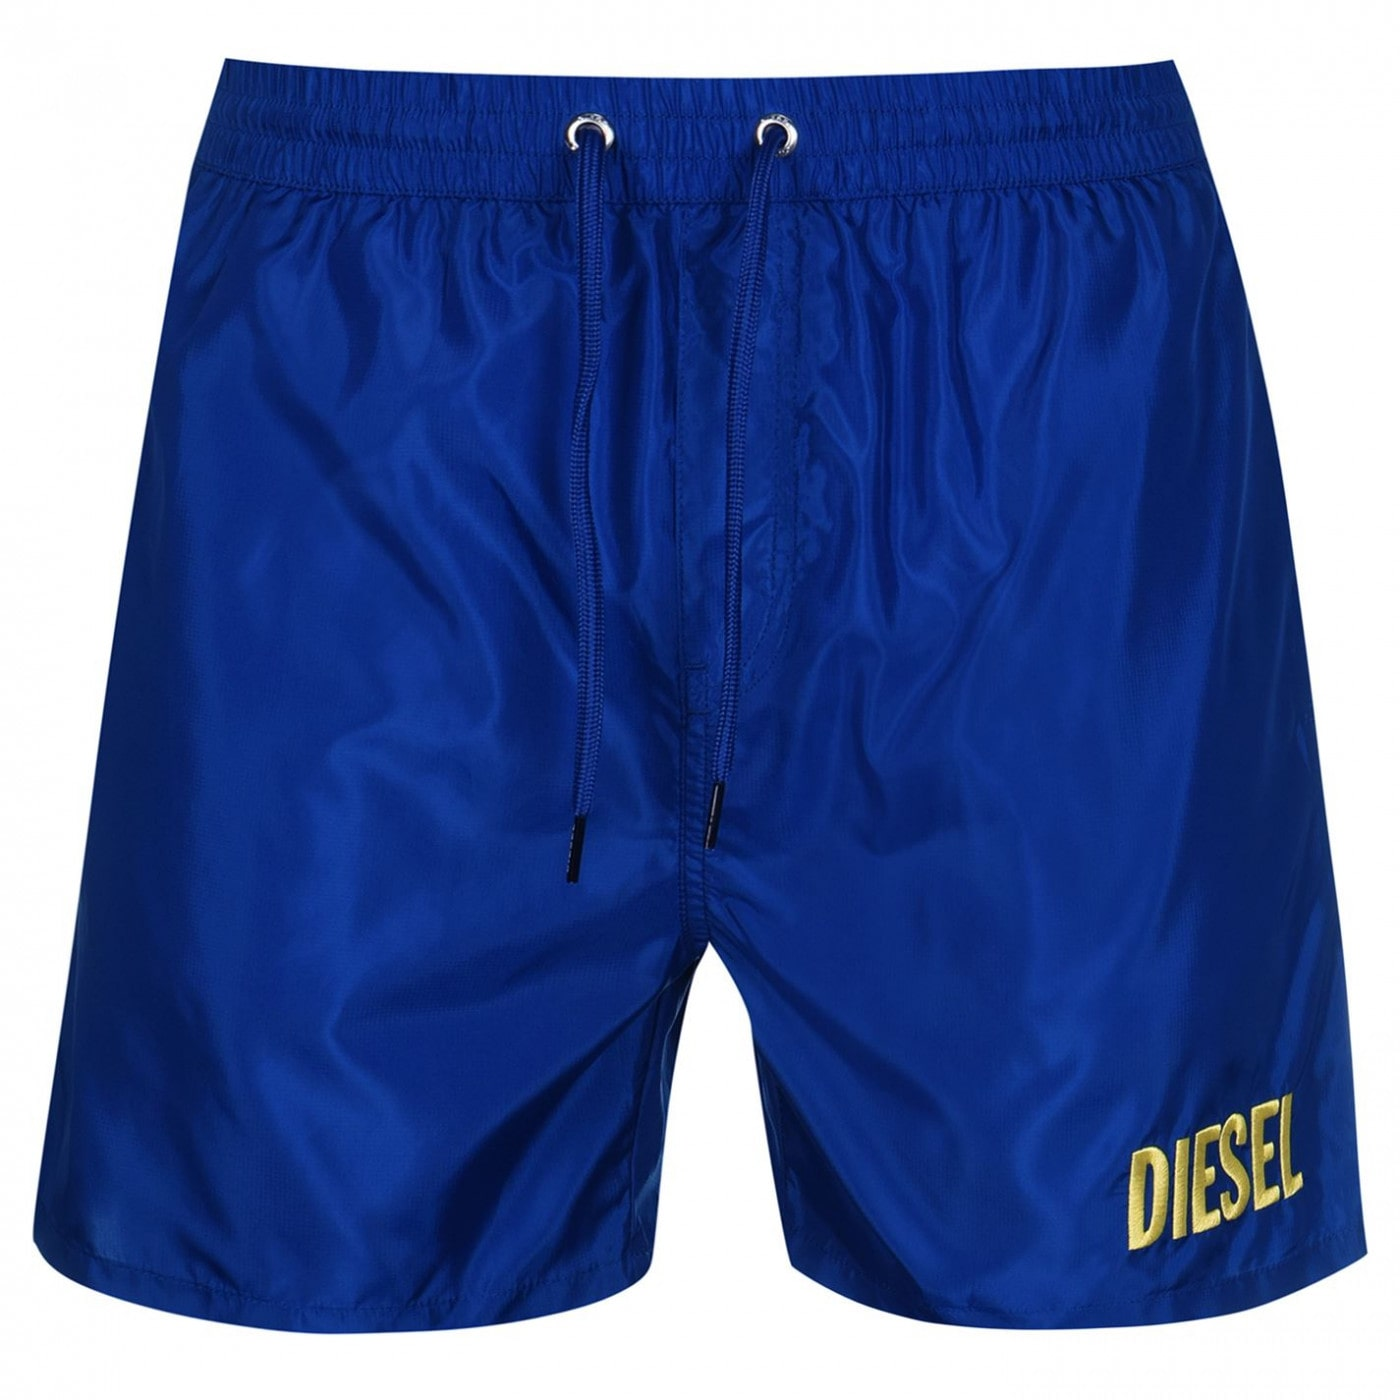 Men's swim shorts Diesel Wave